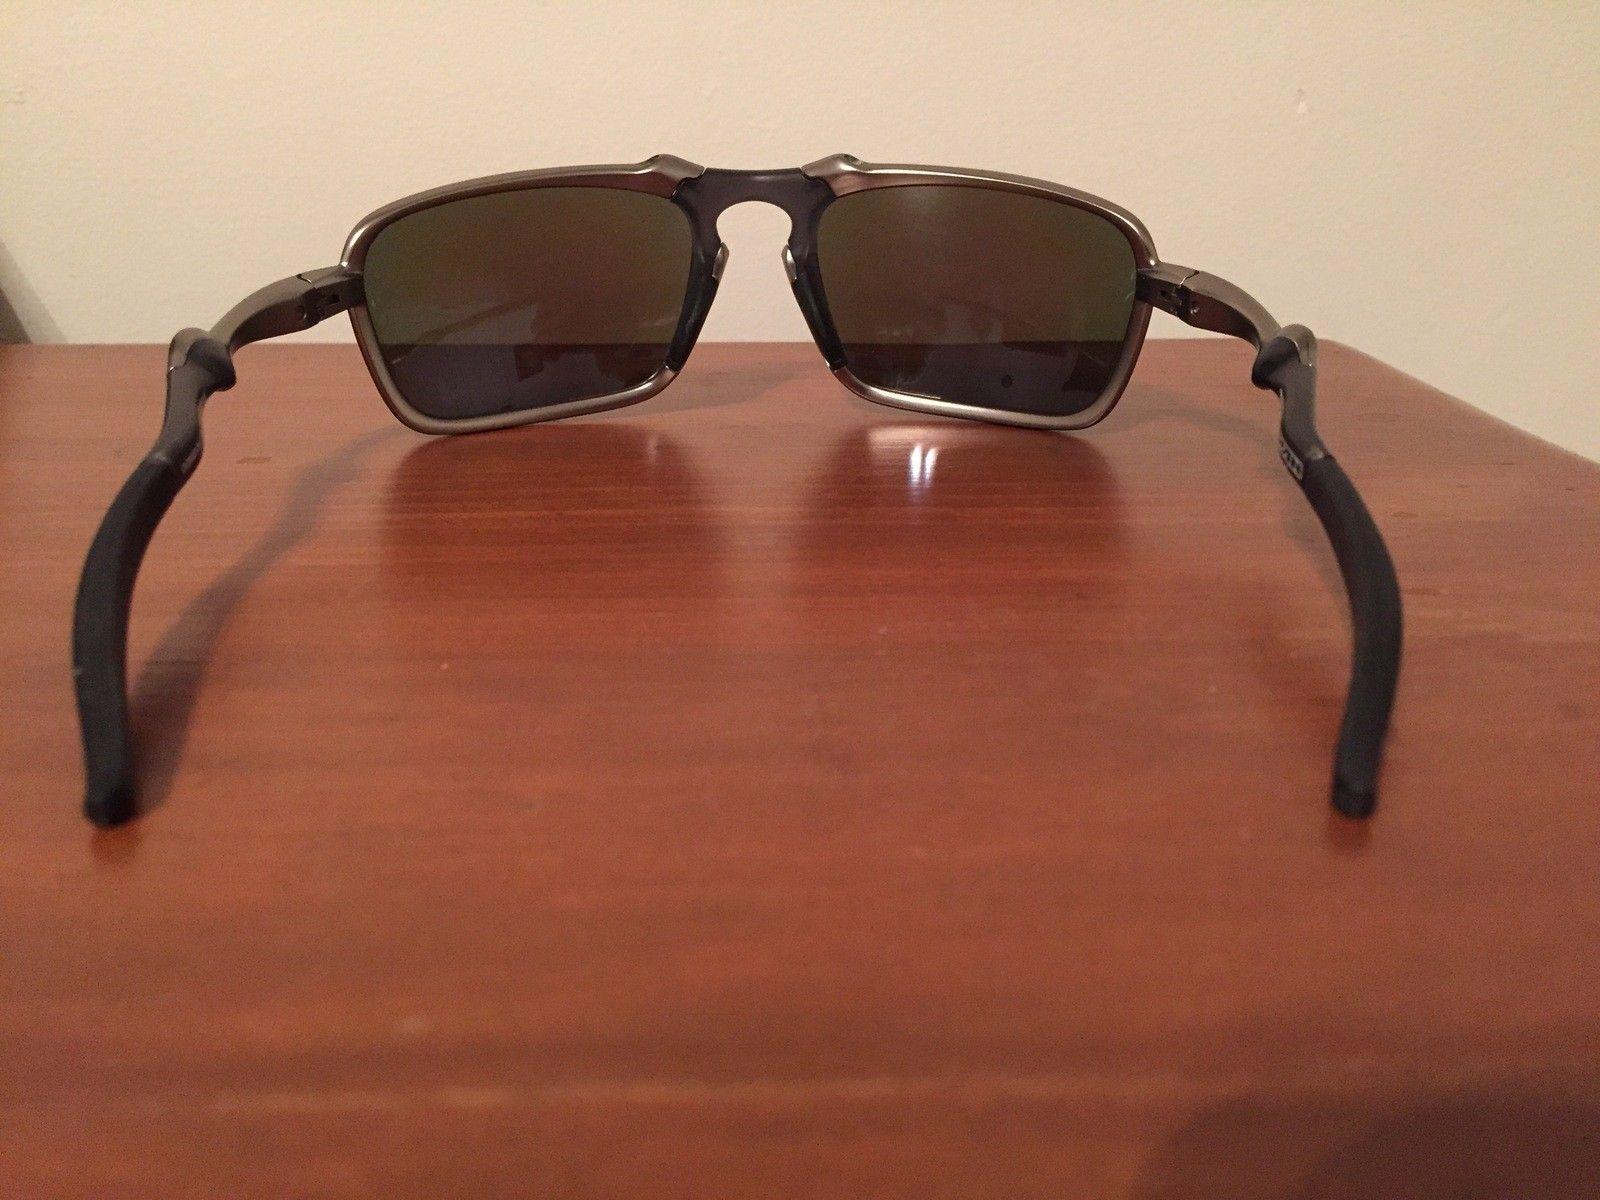 NEW Oakley Badman Sapphire Irid Polarized - IMG_6558.JPG